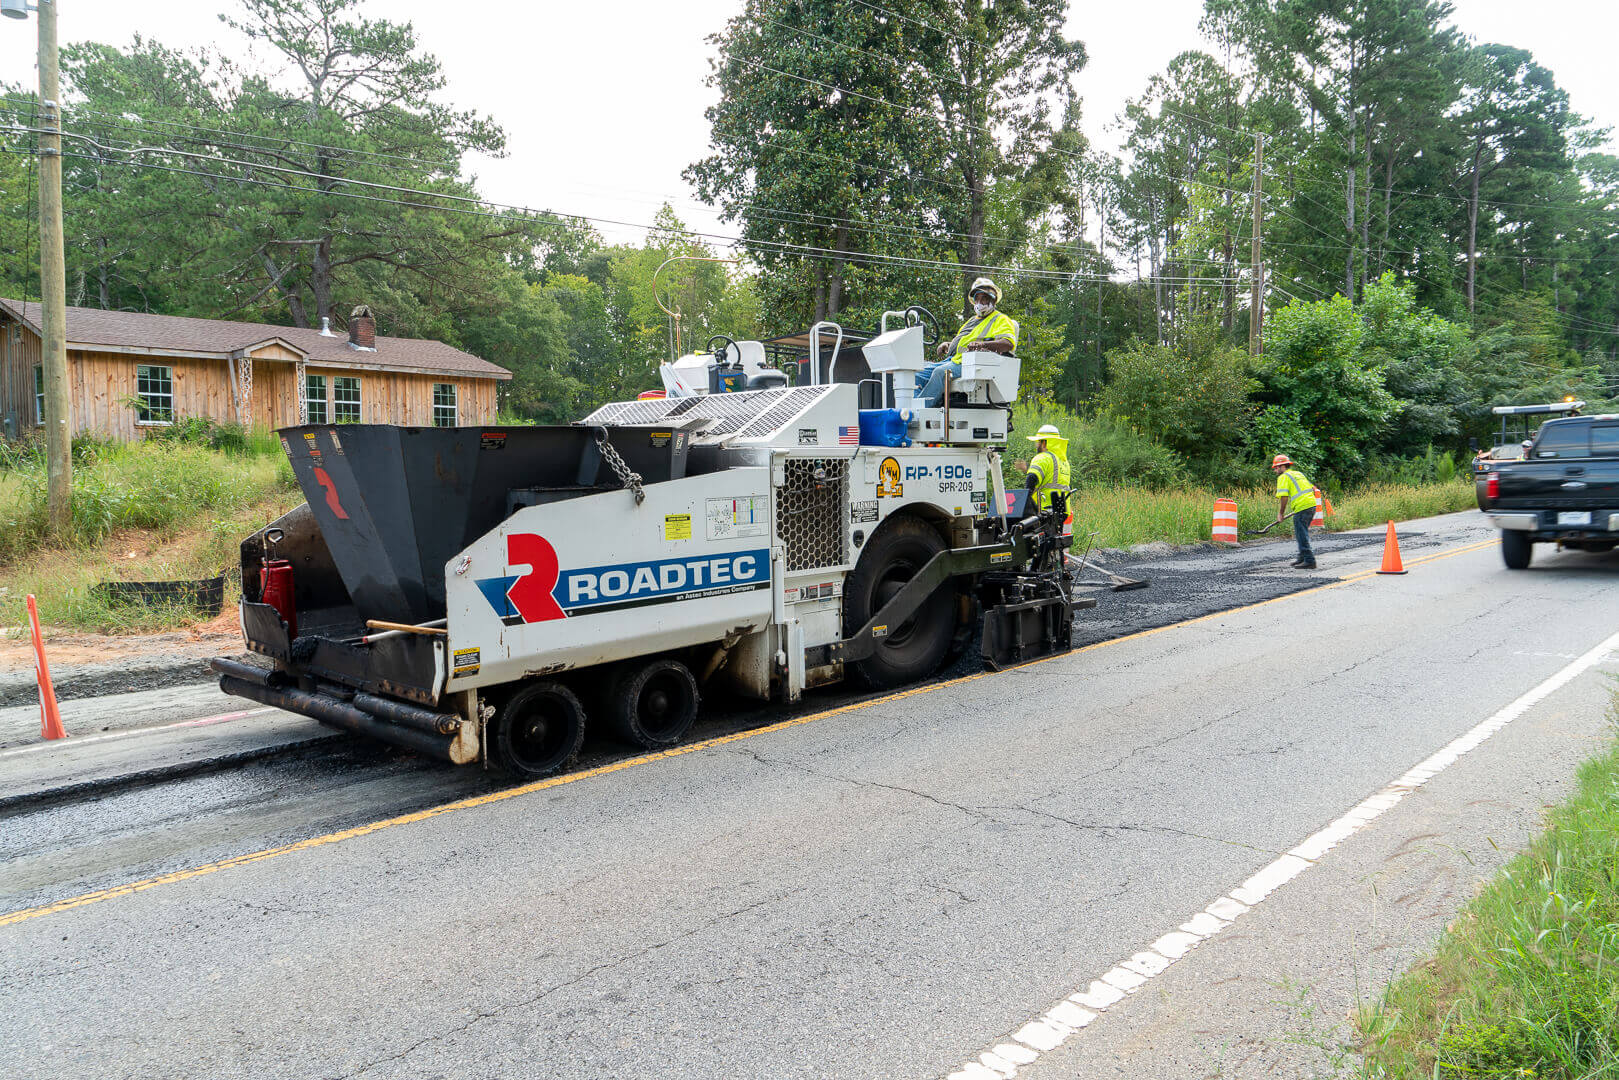 Roadtec RP-190 Highway Class Asphalt Paver paving with hopper insert